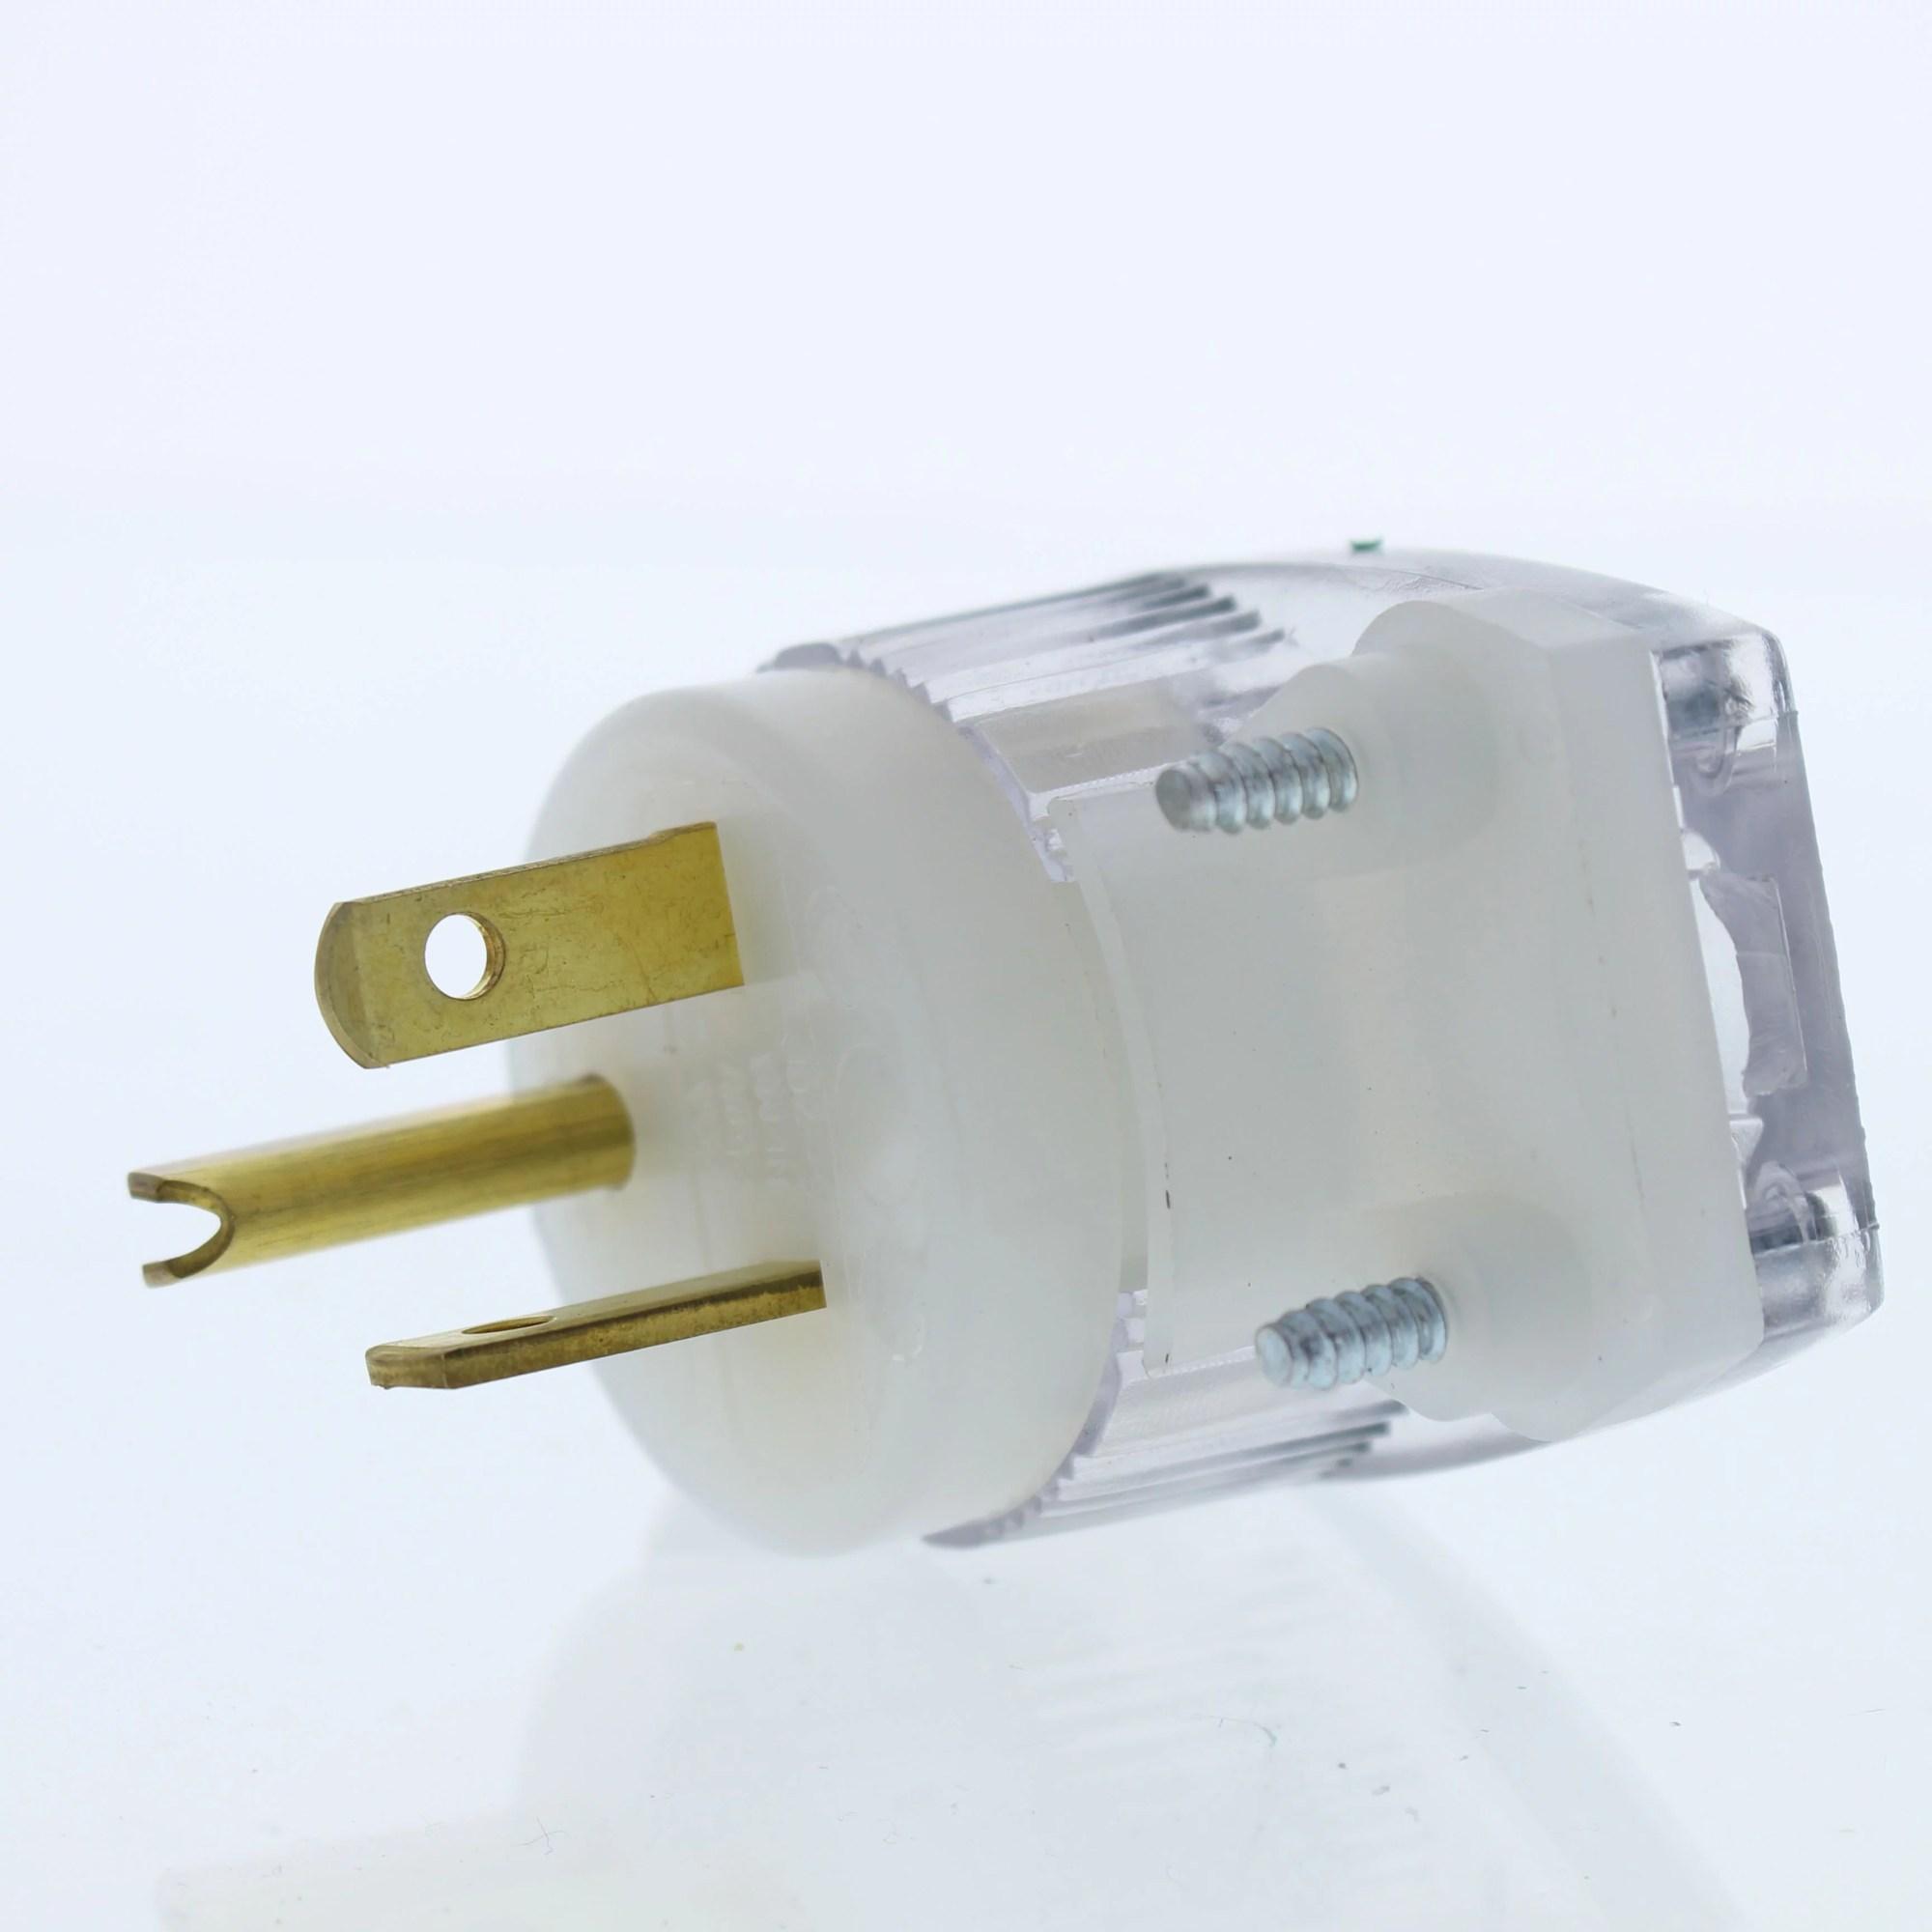 hight resolution of cooper wiring devices 6865hgc straight blade plug angle hg 20a 250v 2p3w walmart com